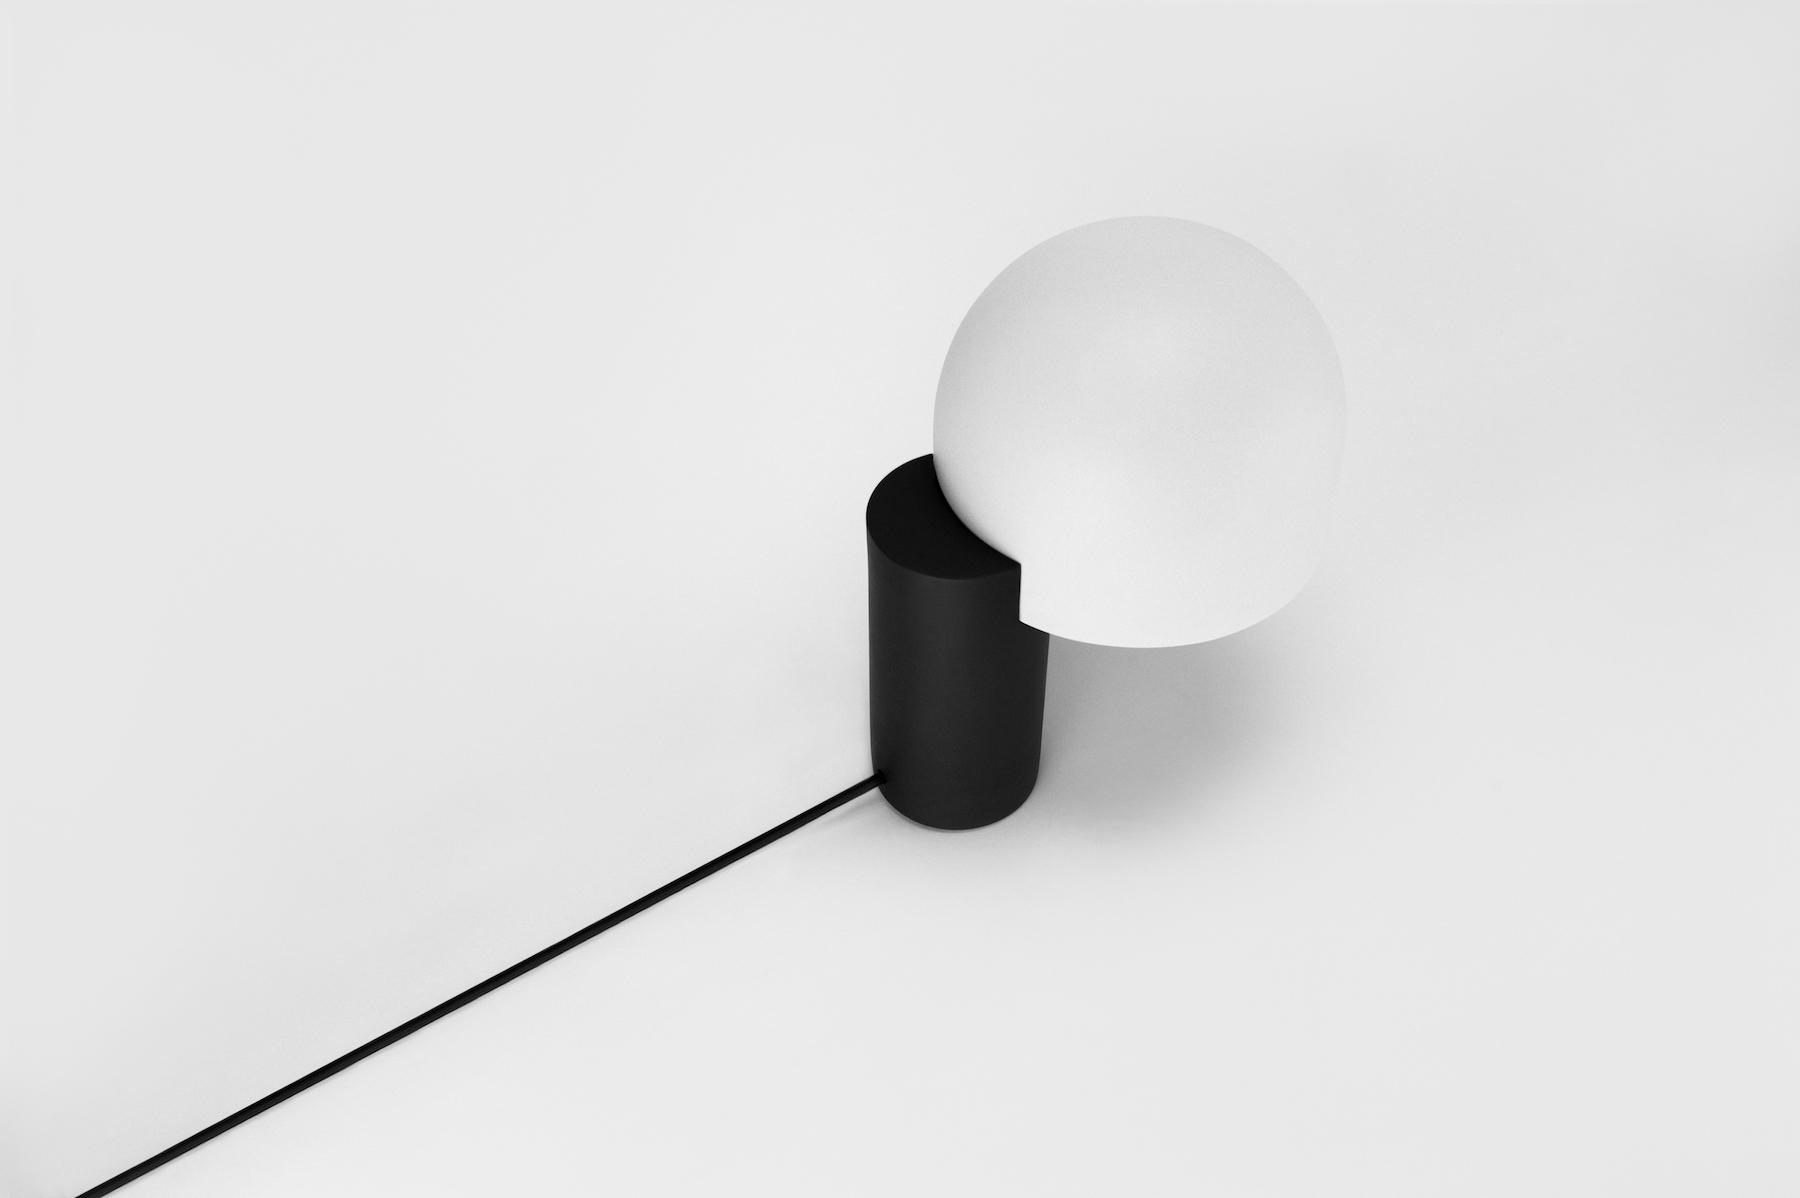 Lu-Lamp-by-Alissa-Coe-Lera-Moiseeva_03.jpg